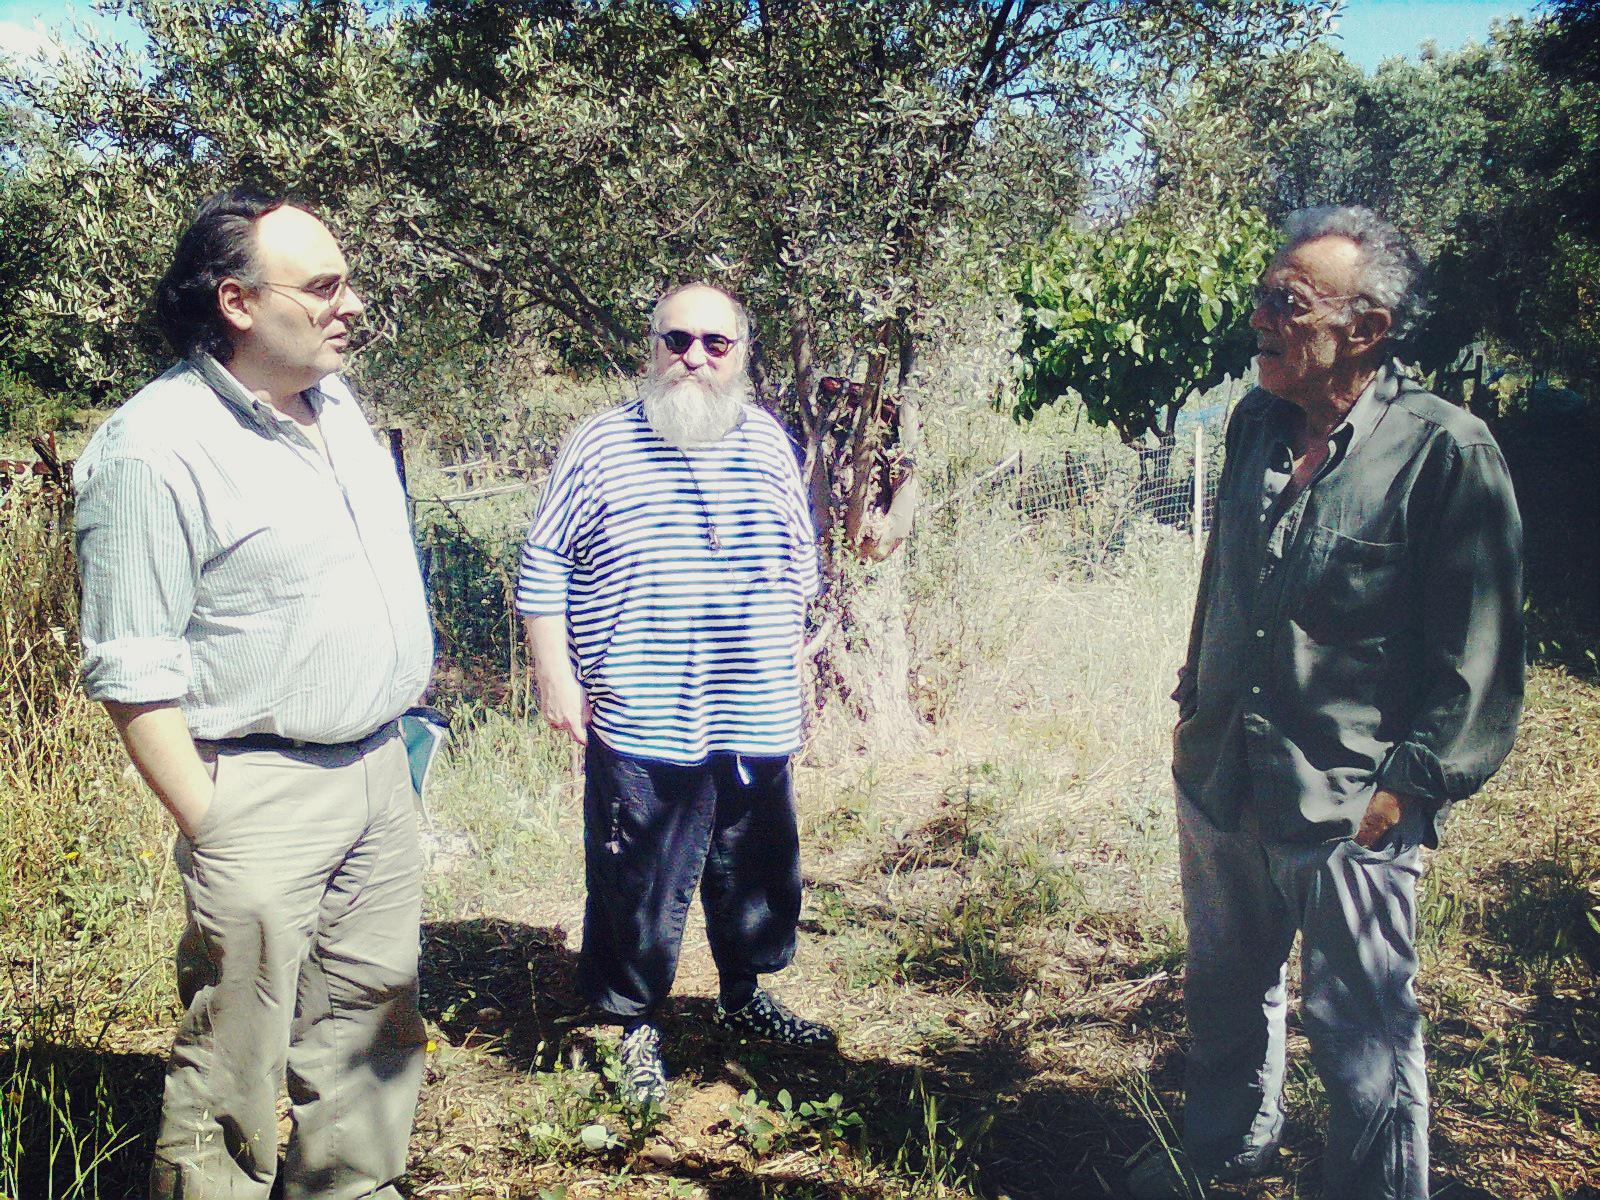 O Χρόνης Μπερτόλης με τον Τζίμη Πανούση και τον Γιώργο Πανουσόπουλο στην Παιανία. Φωτογραφία: Σωτήρης Κακίσης